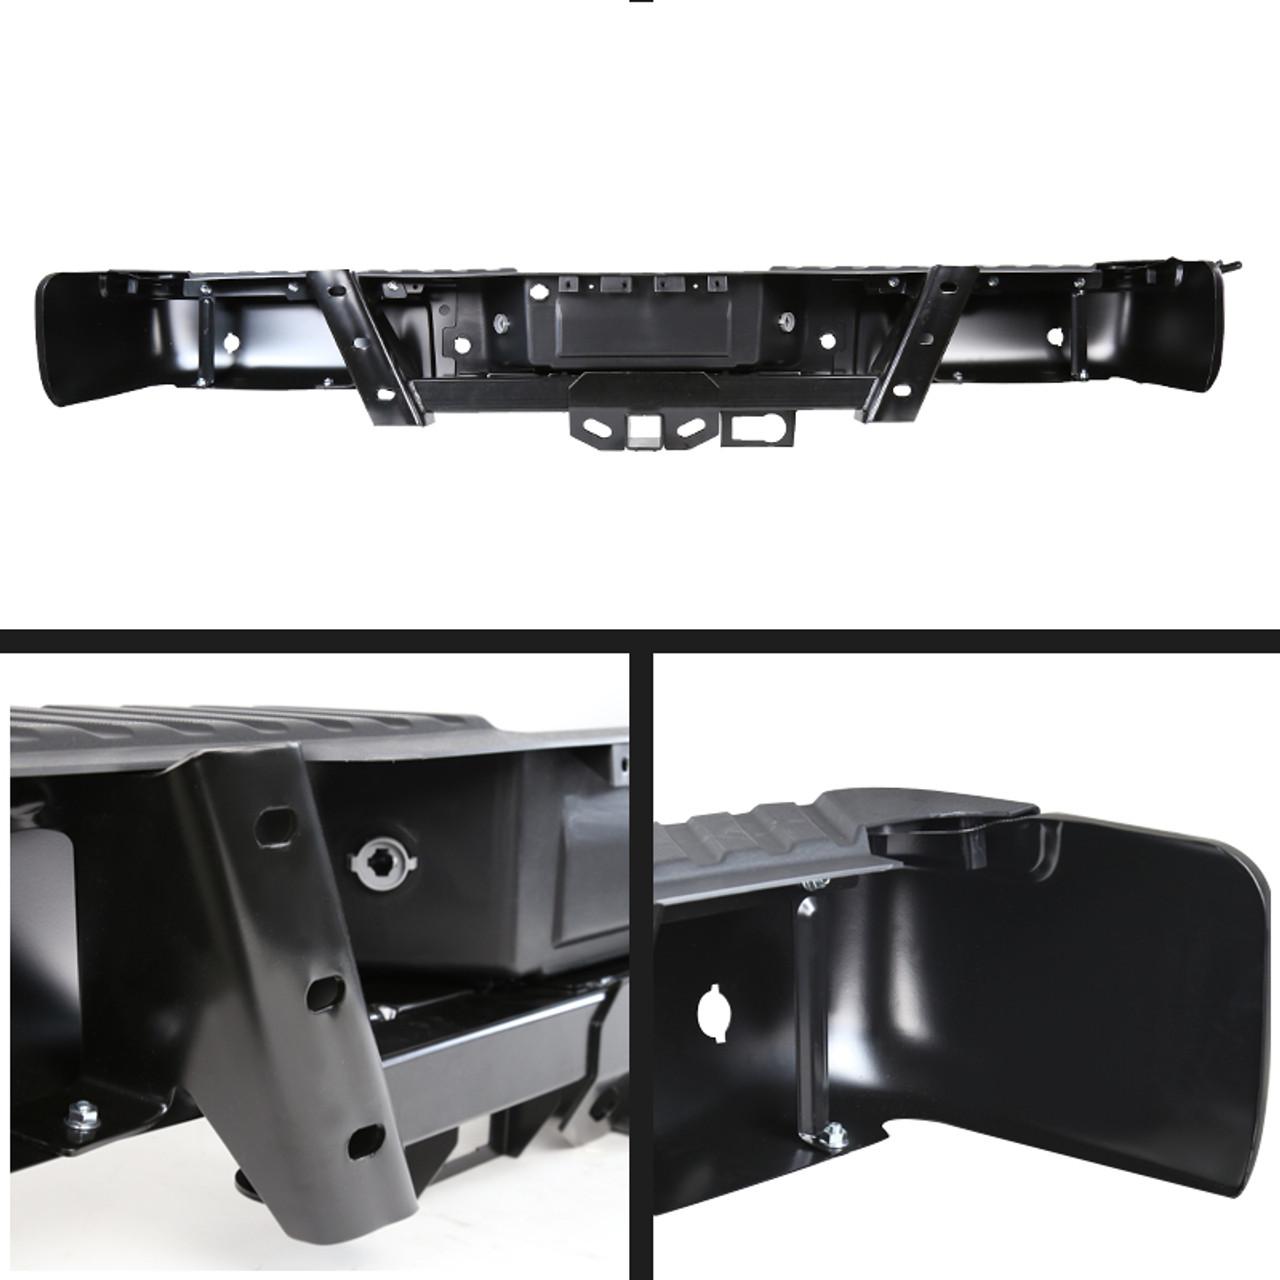 Brackets Lights Set Step Pads For 2009-2014 Ford F-150 Standard//Styleside Bed Rear Bumper No Sensor Hole